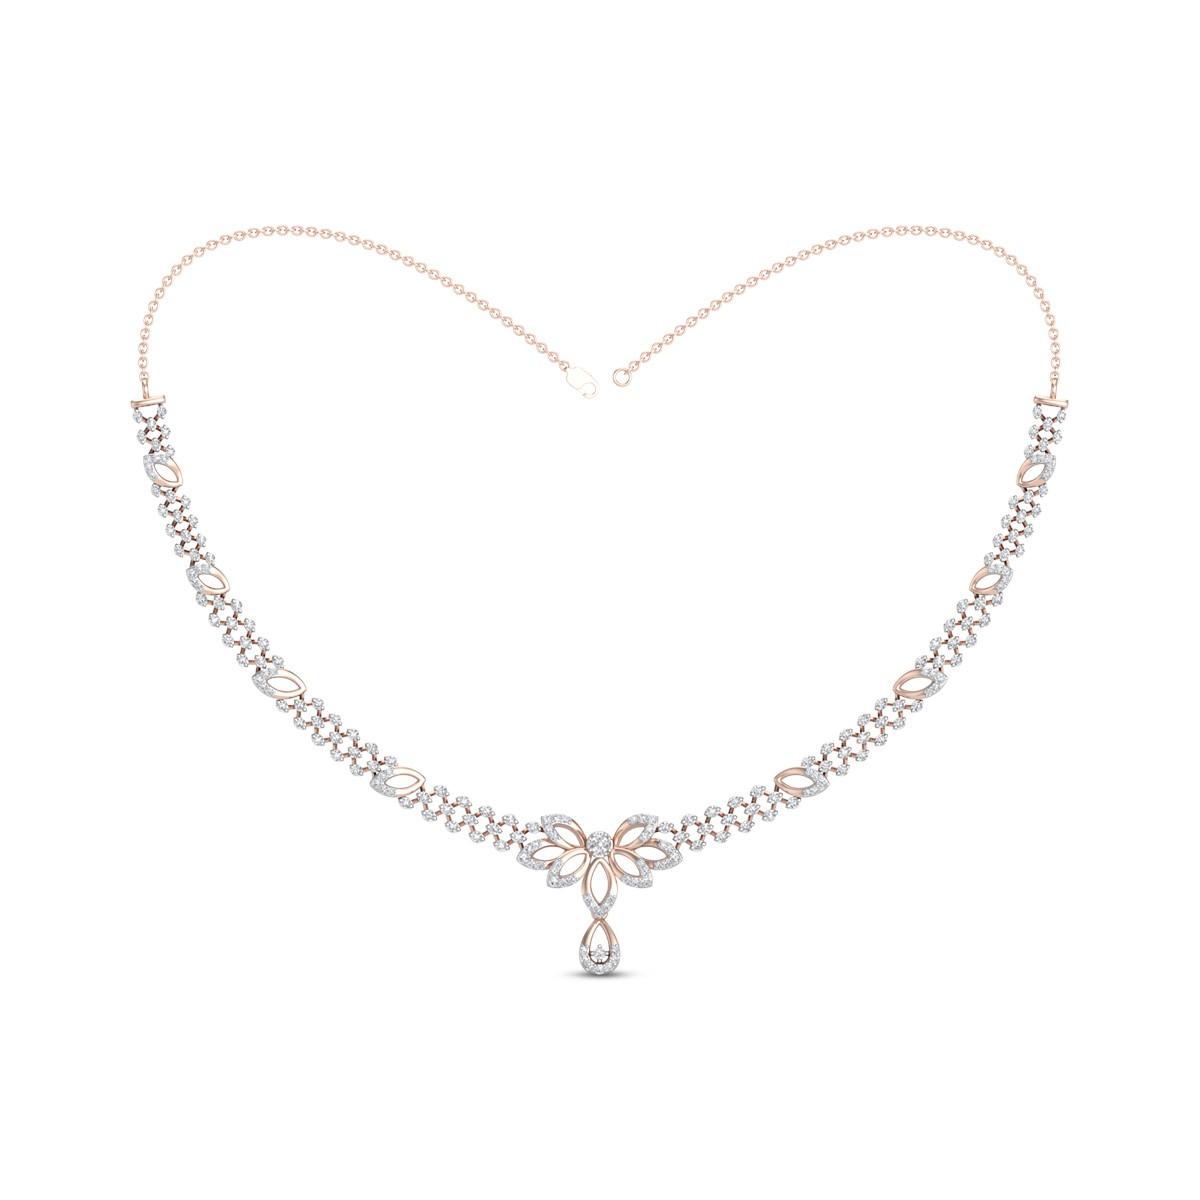 Diamond Necklace DJNC5096